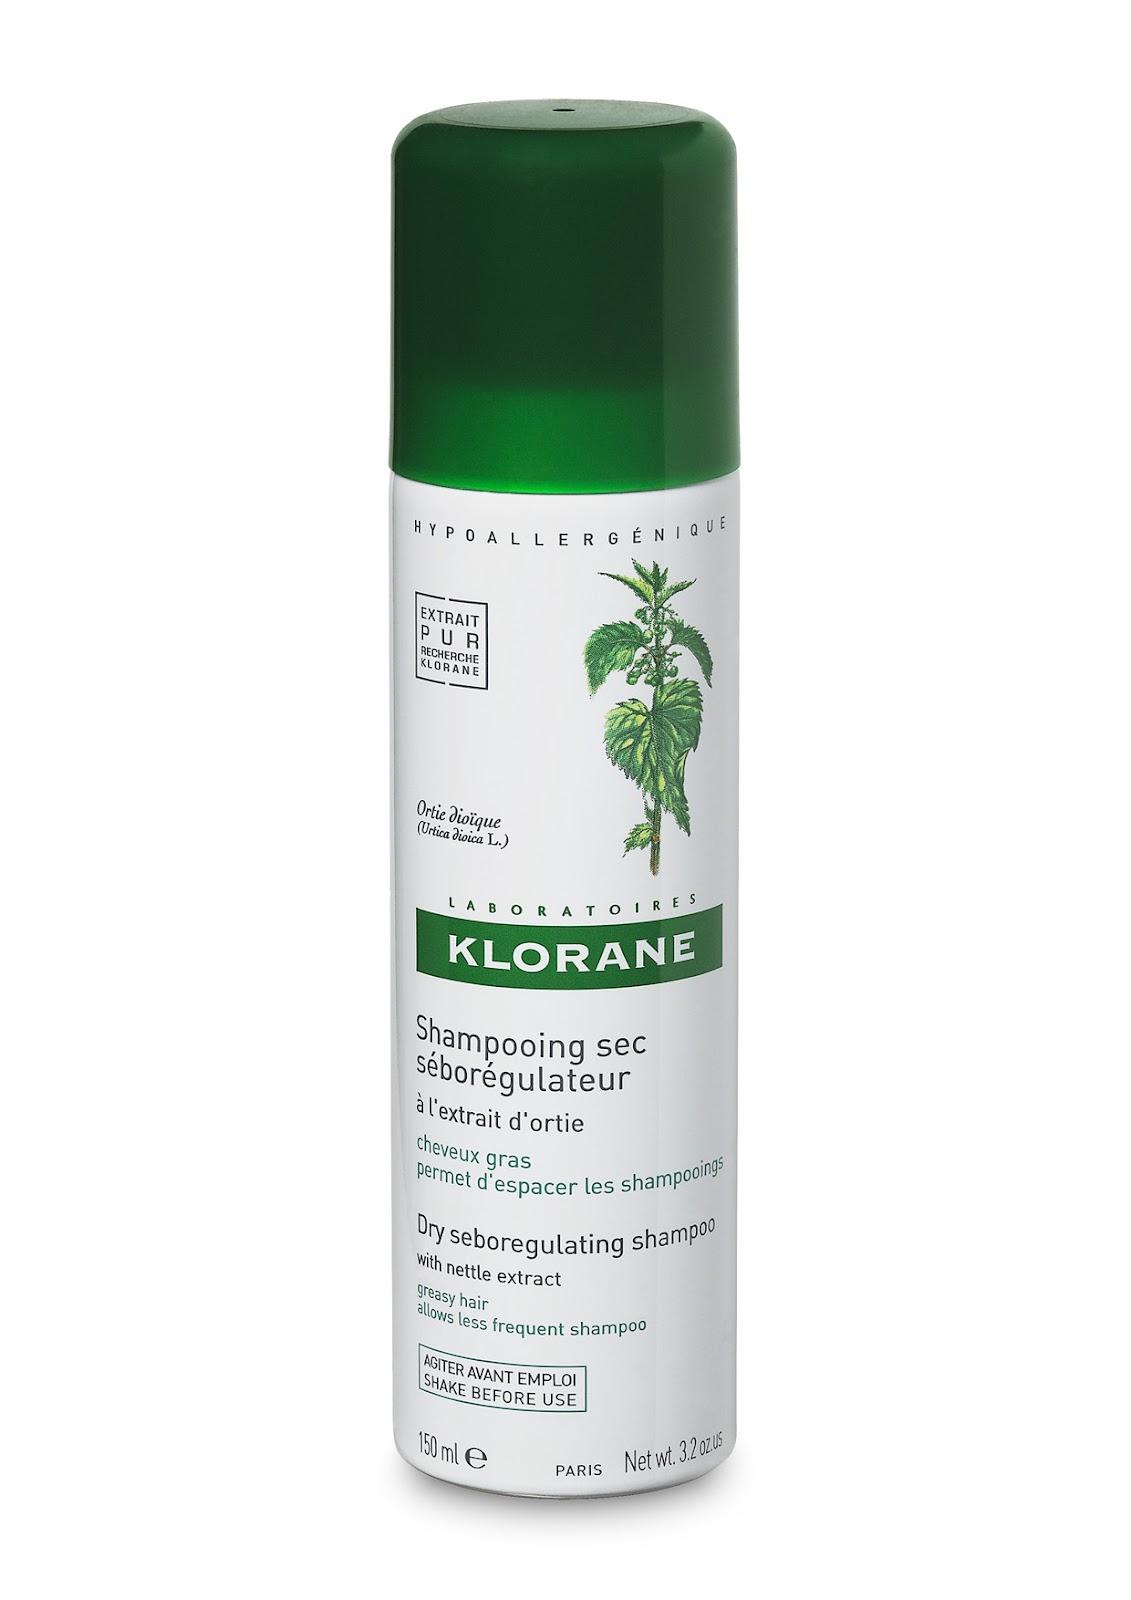 Klorane Dry Shampoo Klorane Dry Shampoo O Money After Graduation